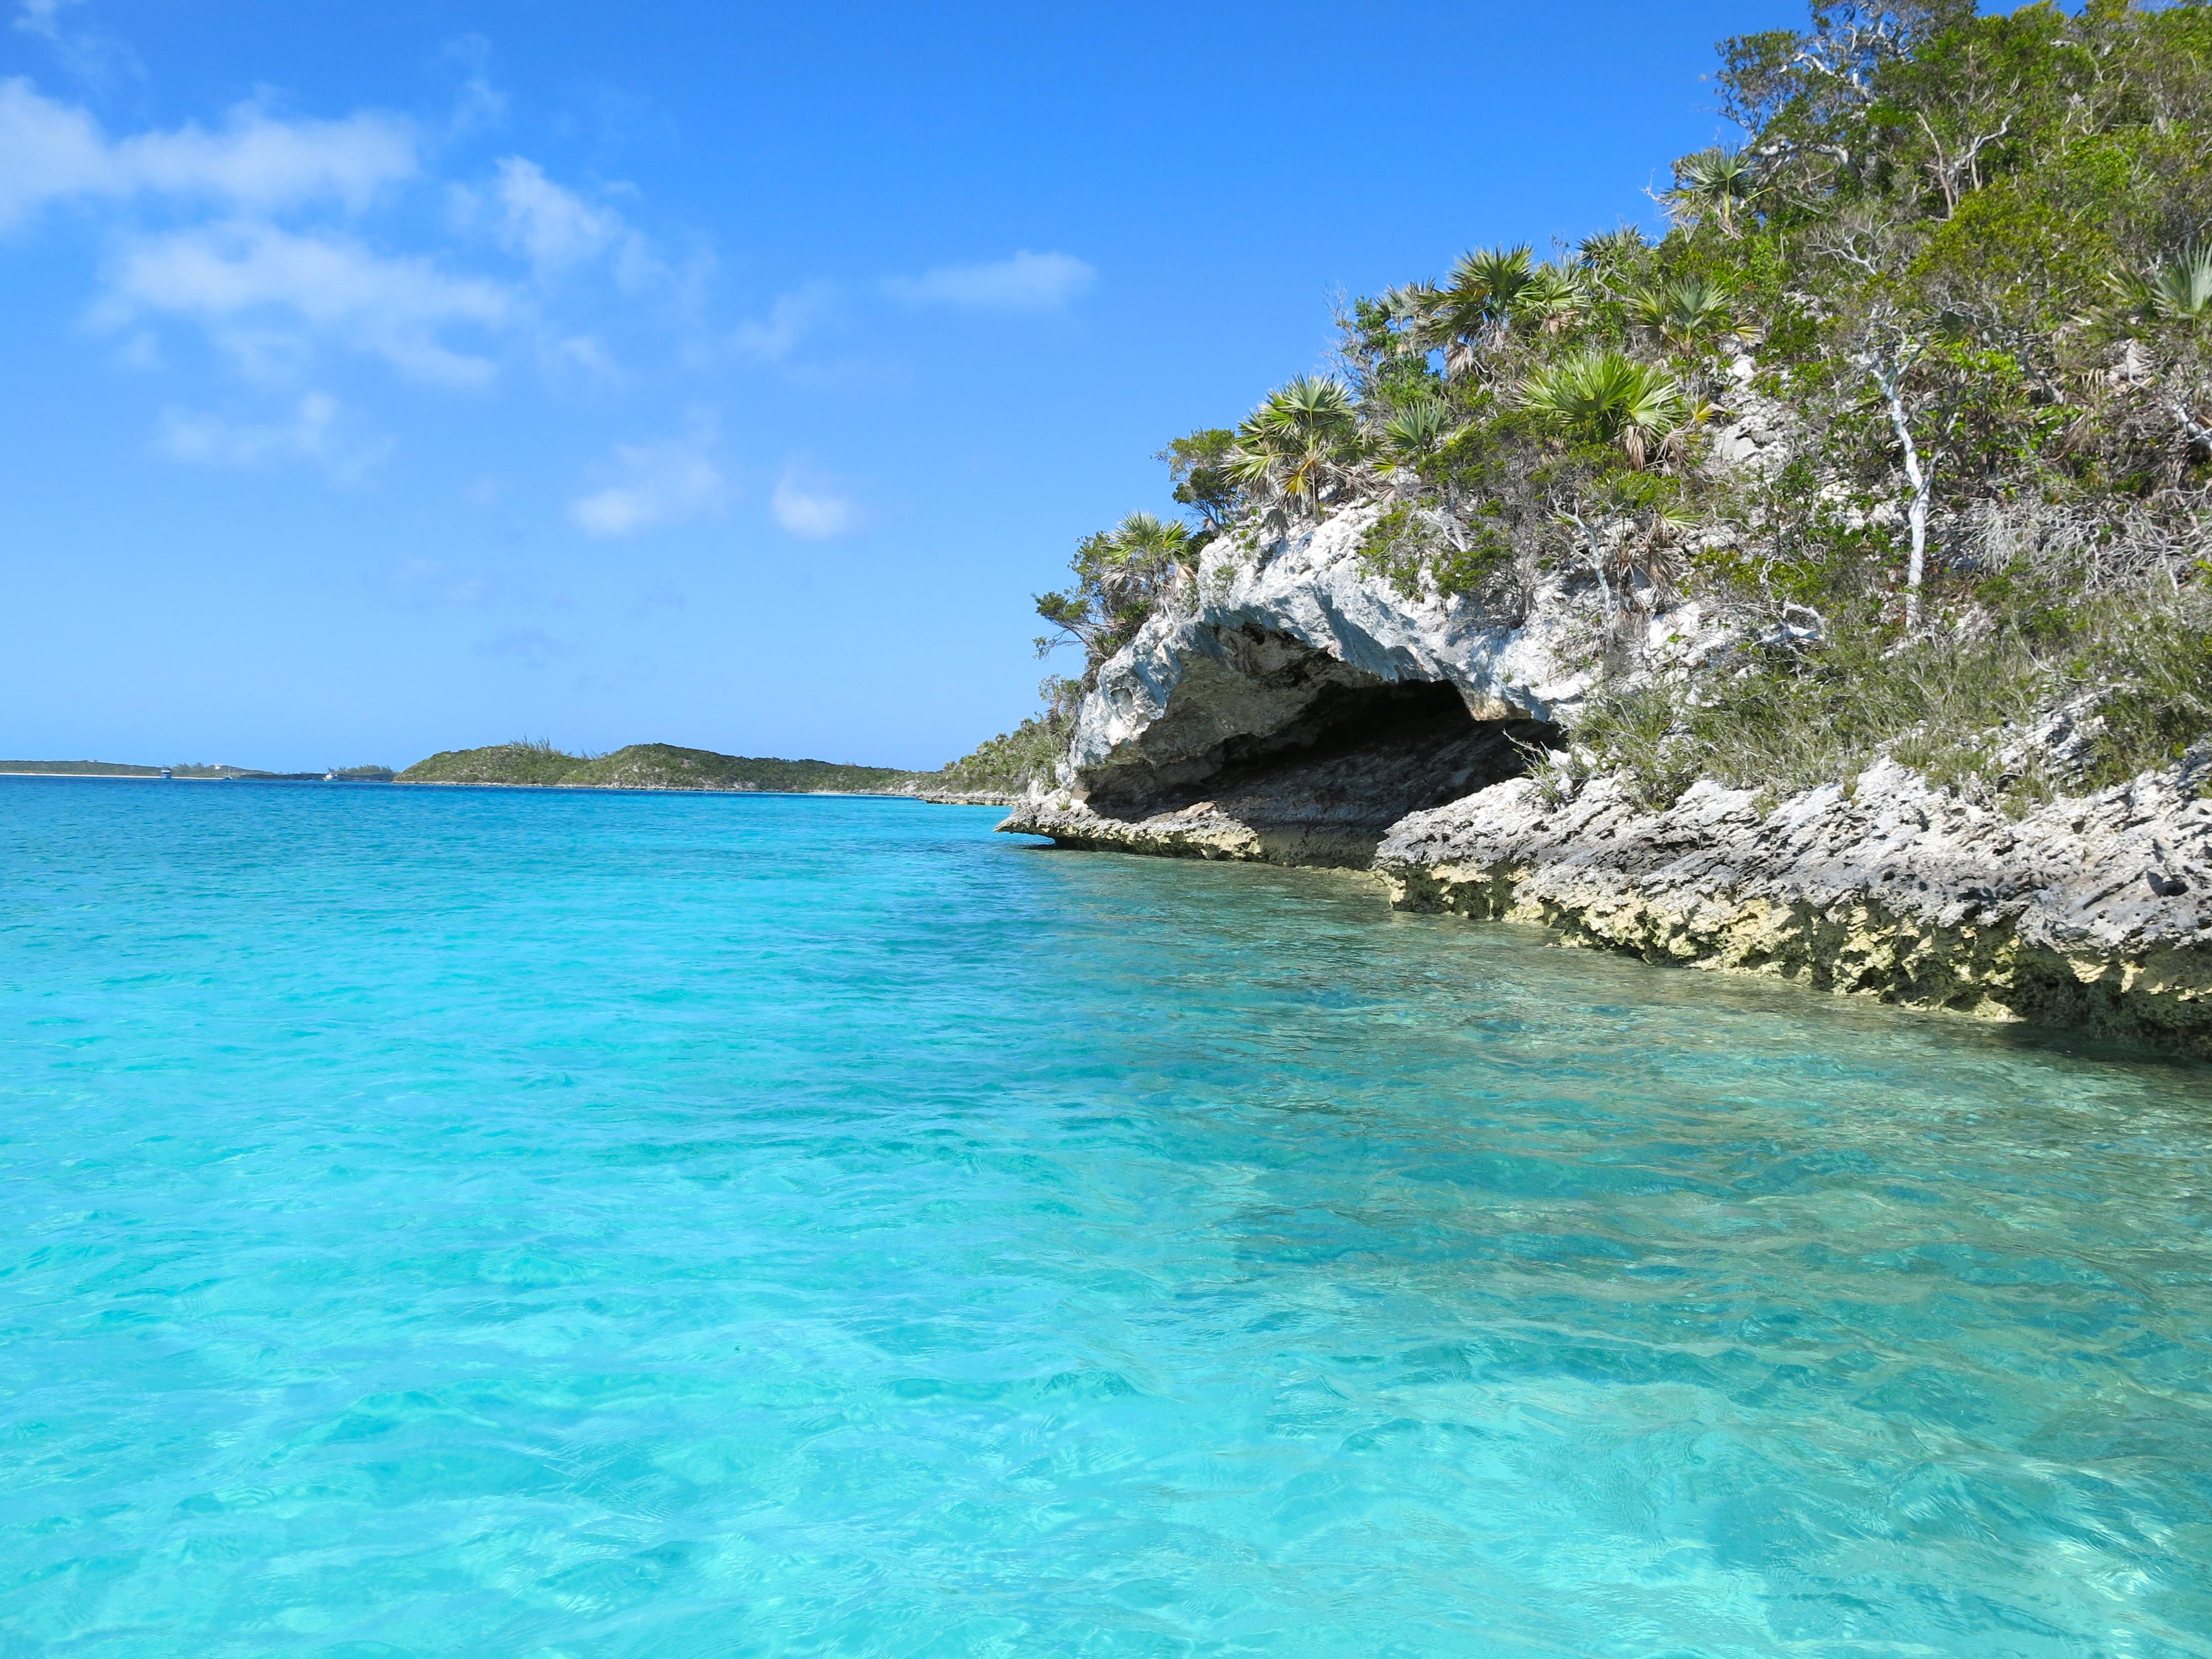 Noleggio Barche Norman's Cay - Navalia | Noleggia un Sogno